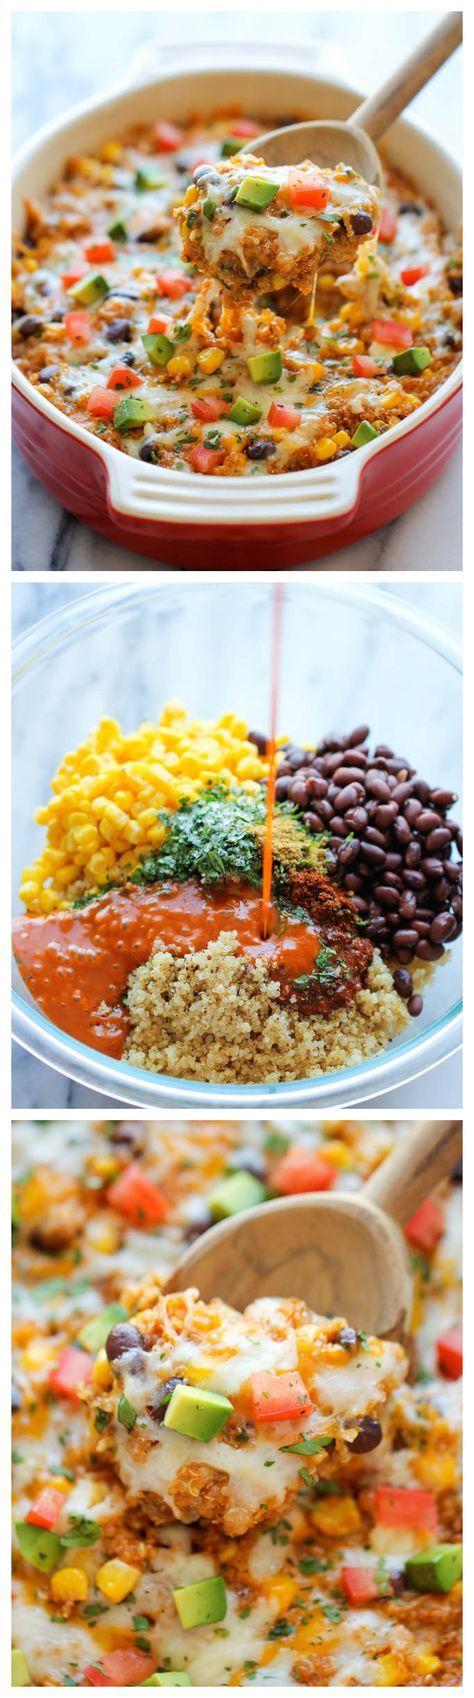 Quinoa Enchilada Casserole - A lightened-up, healthy enchilada bake chockfull of quinoa, black beans and cheesy goodness! /damndelicious/